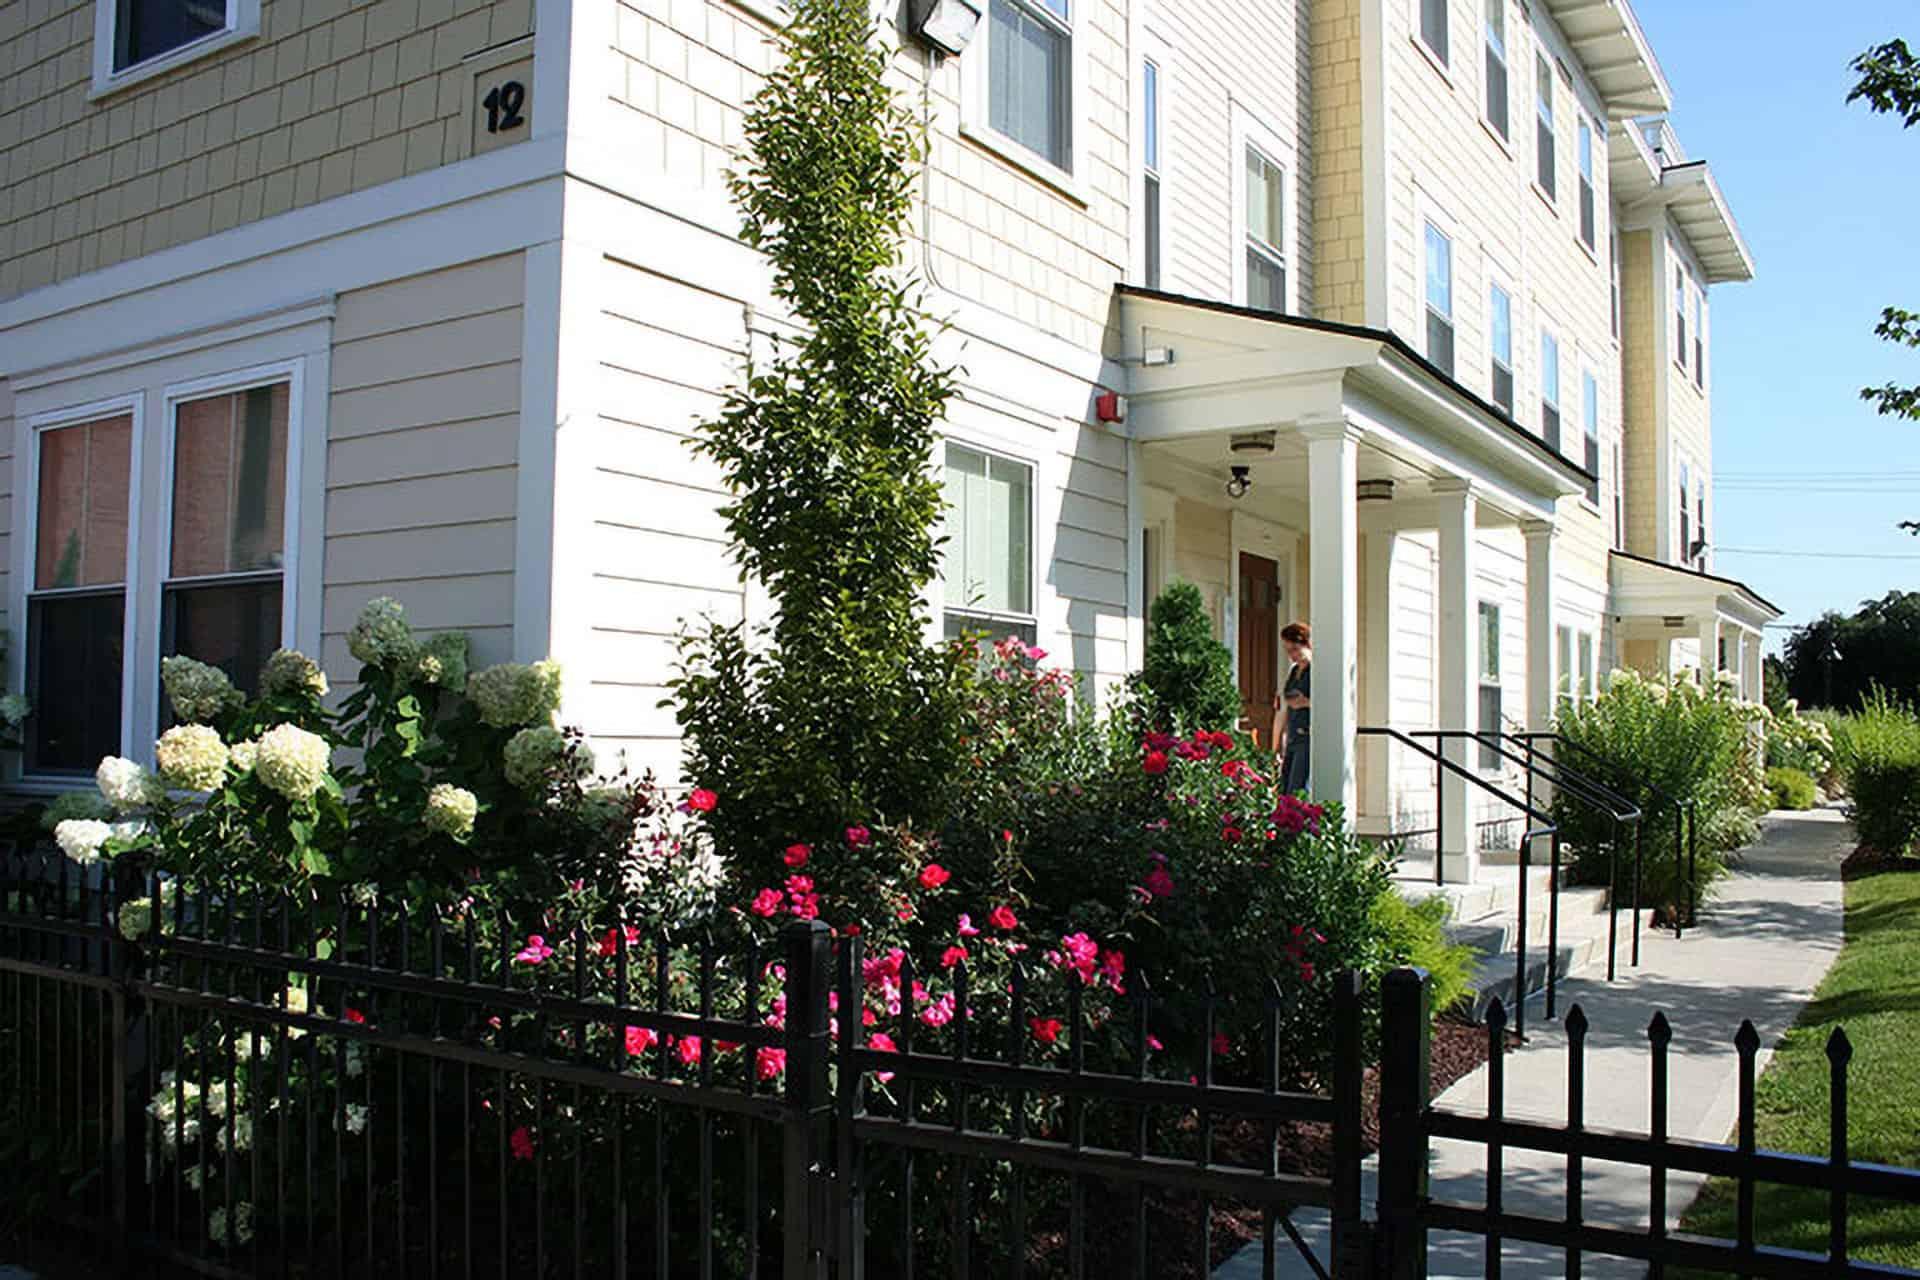 This 10 unit apartment complex is part of SWAP's Trinity Place development